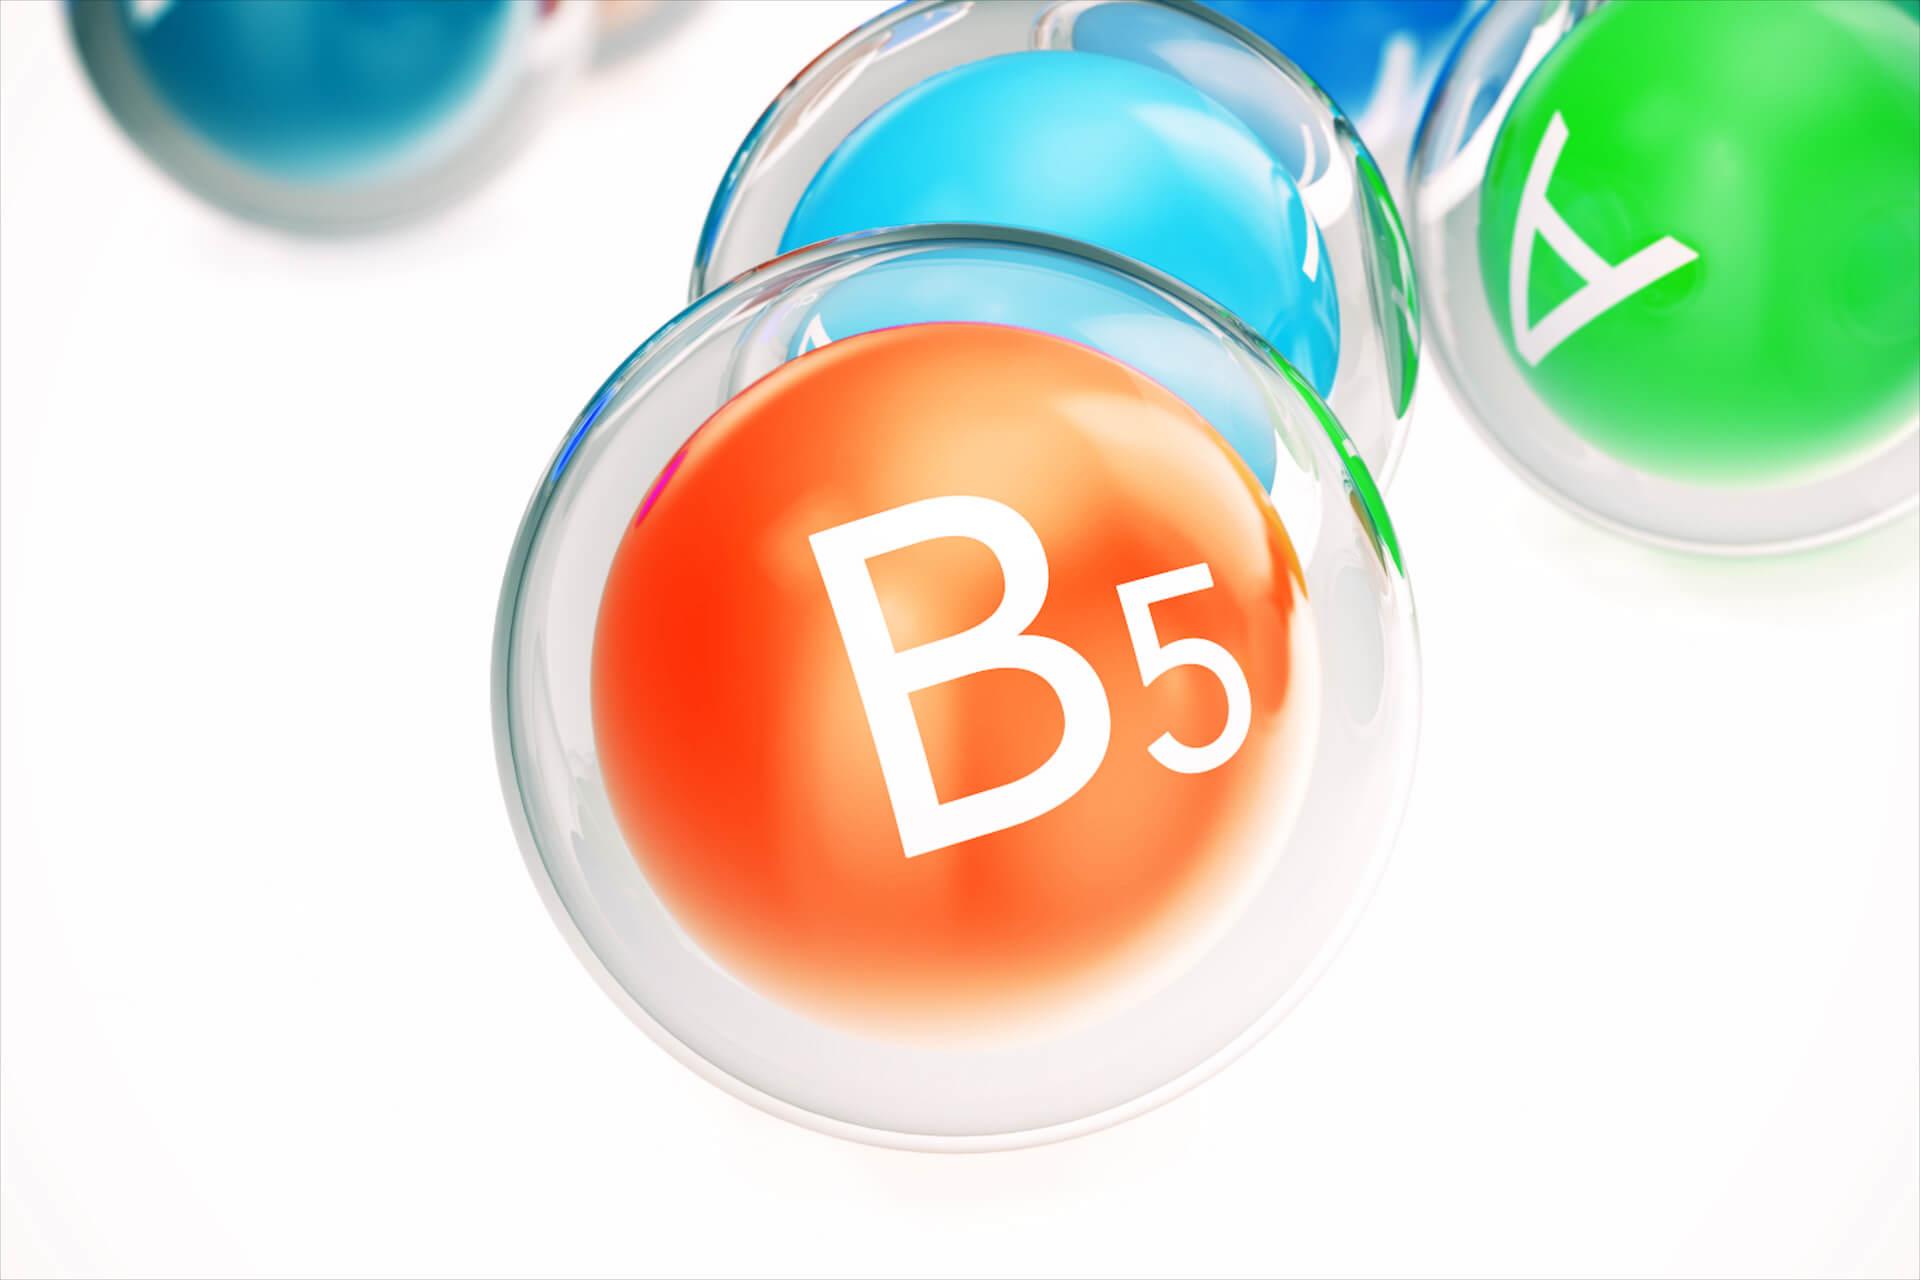 A panthenol a bőrben b5 vitaminná alakul